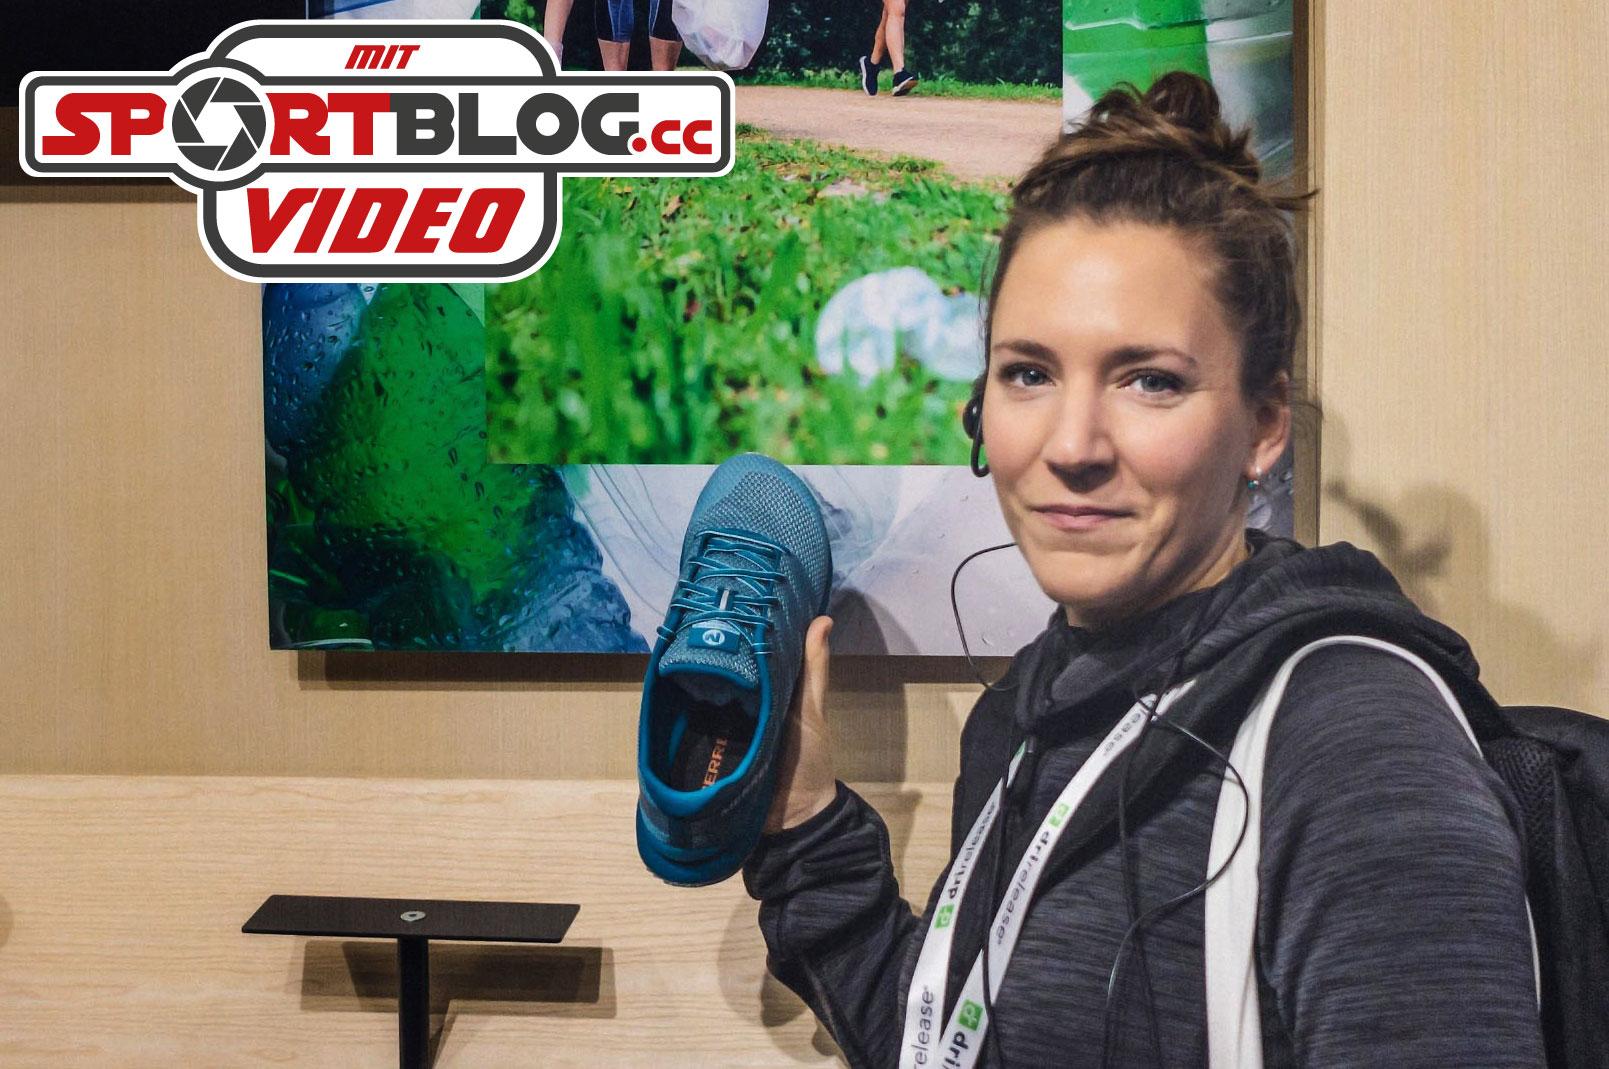 Fitnessbloggerin Bernadette Hörner demonstriert Trailschuh